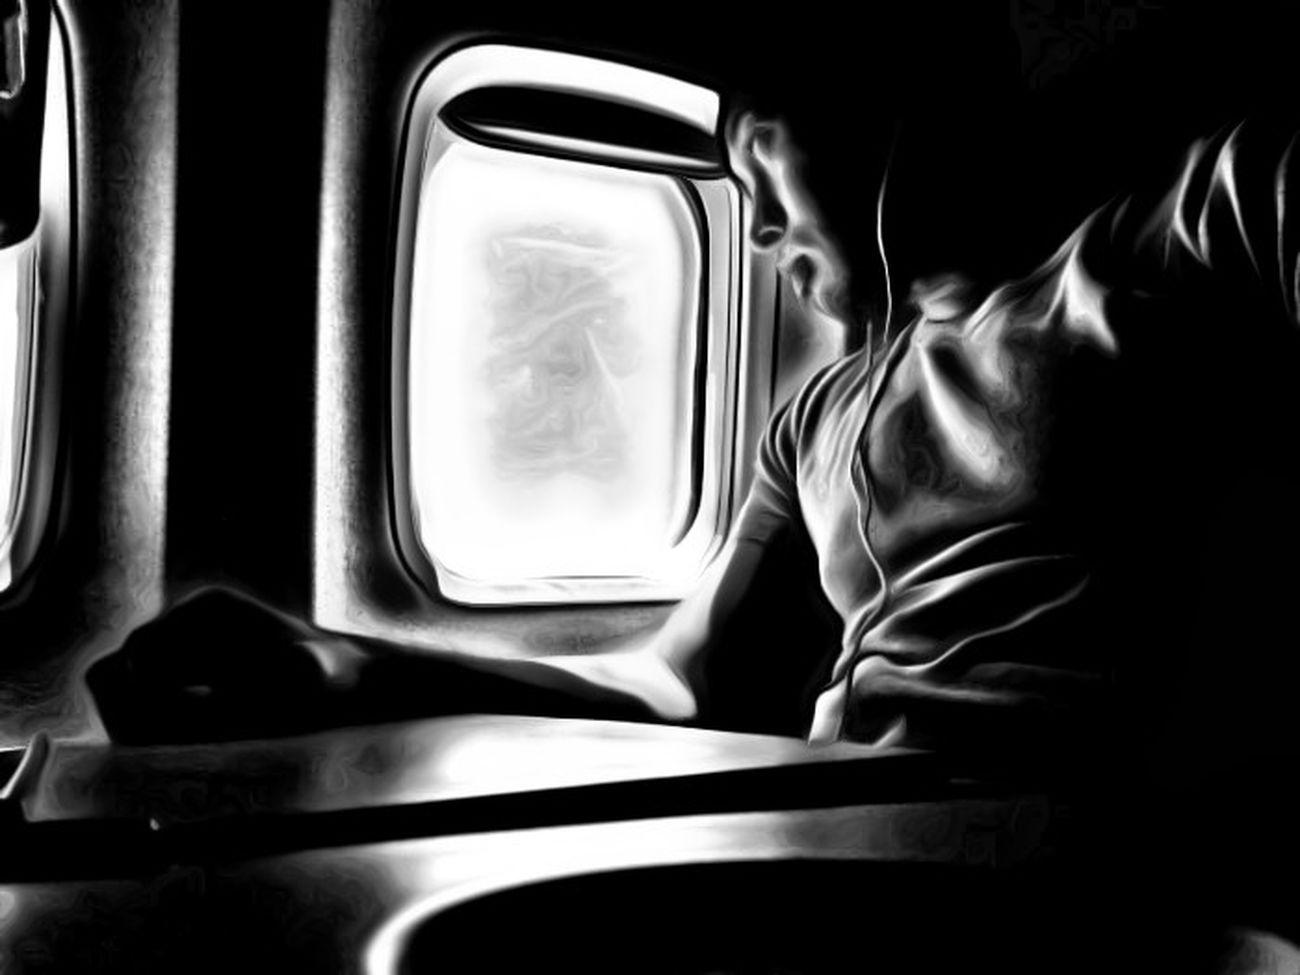 From An Airplane Window EyeEm Best Shots - Black + White HDR Selfportrait